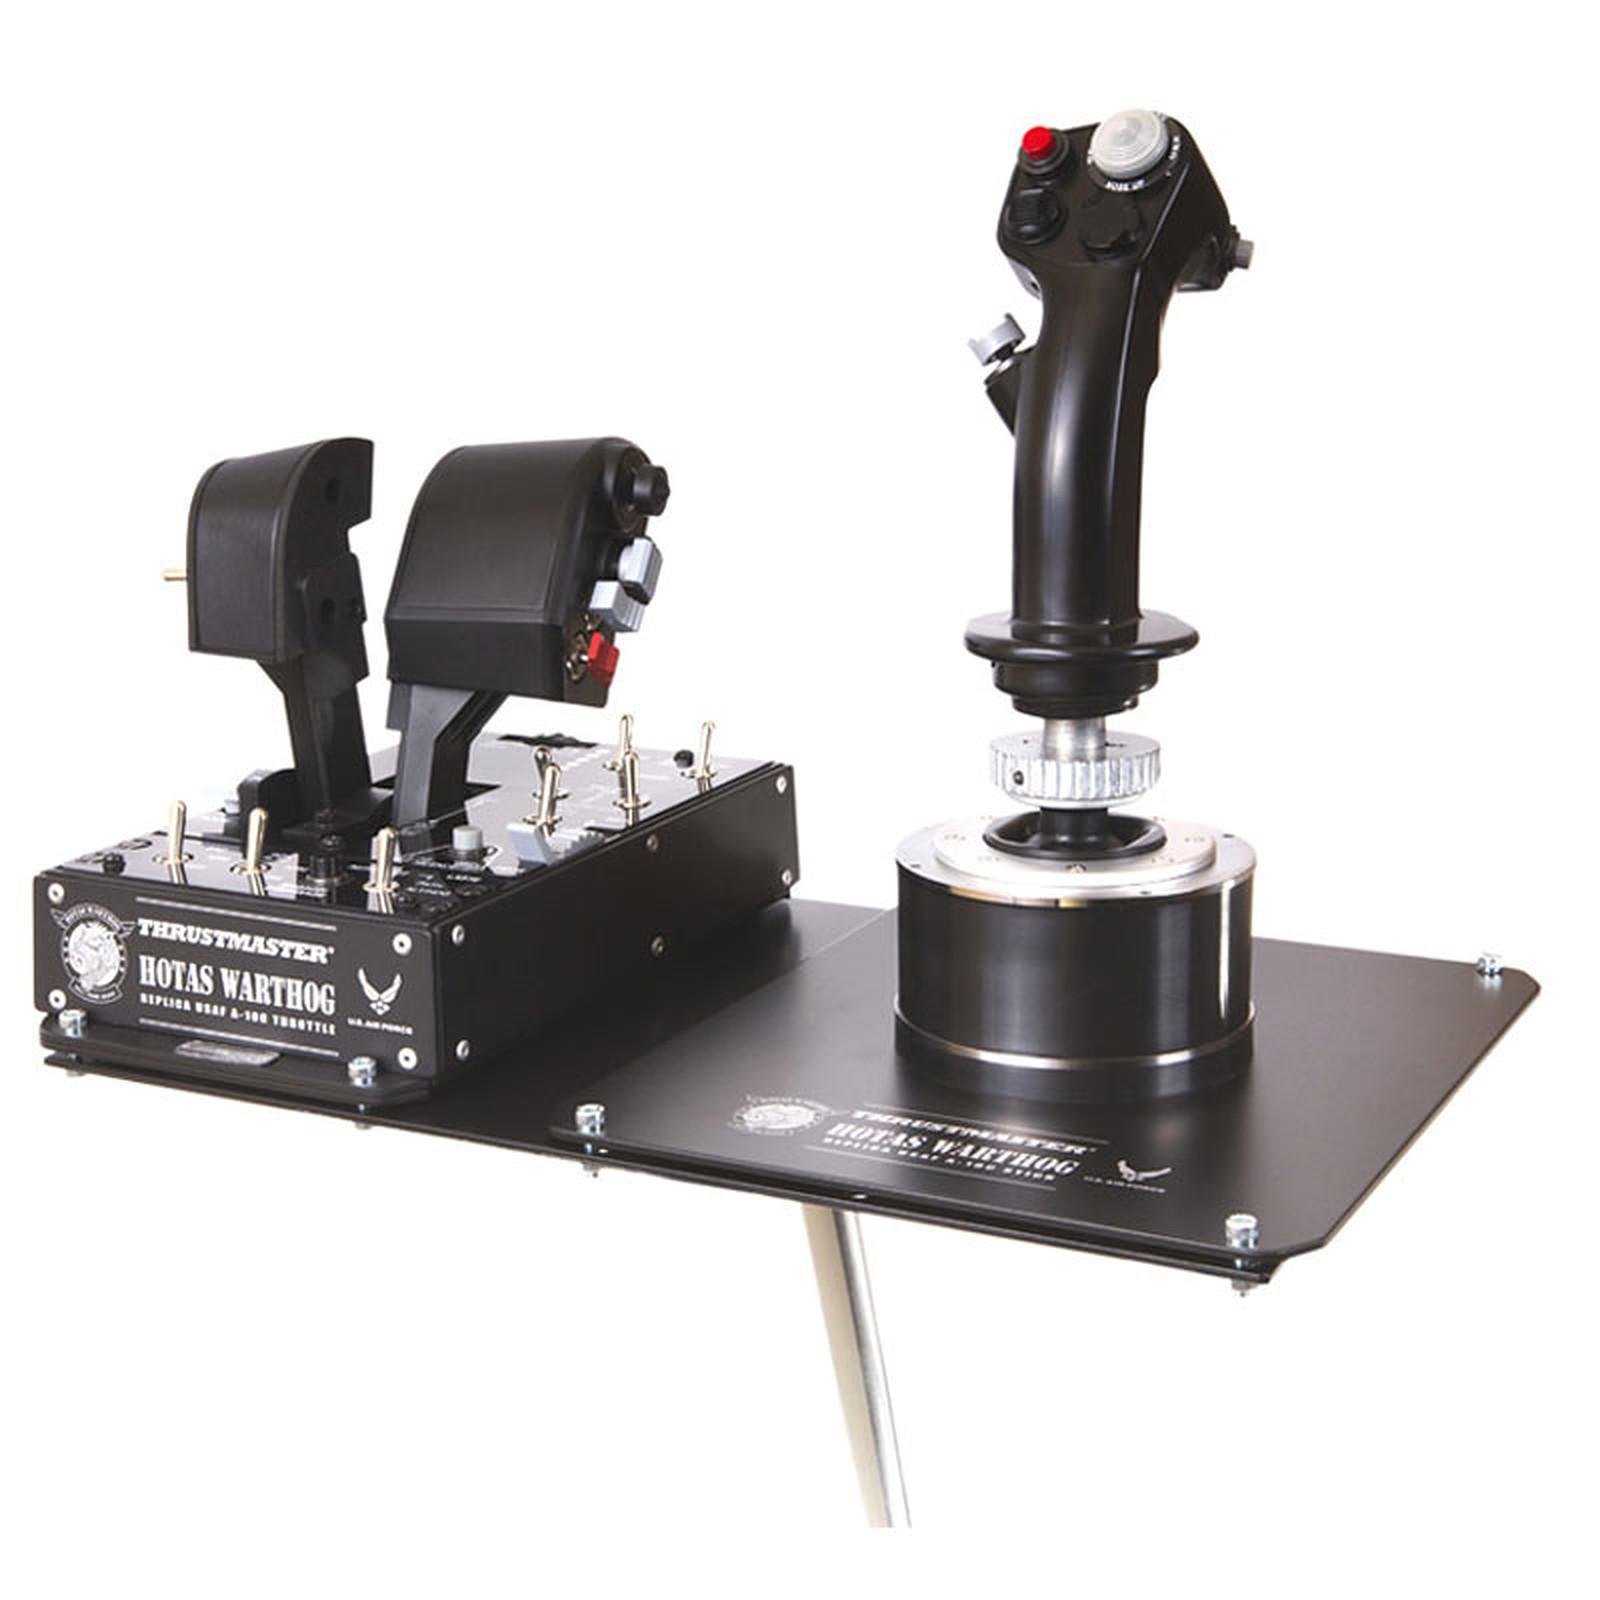 Thrustmaster HOTAS WARTHOG + Wheel Stand Pro v2